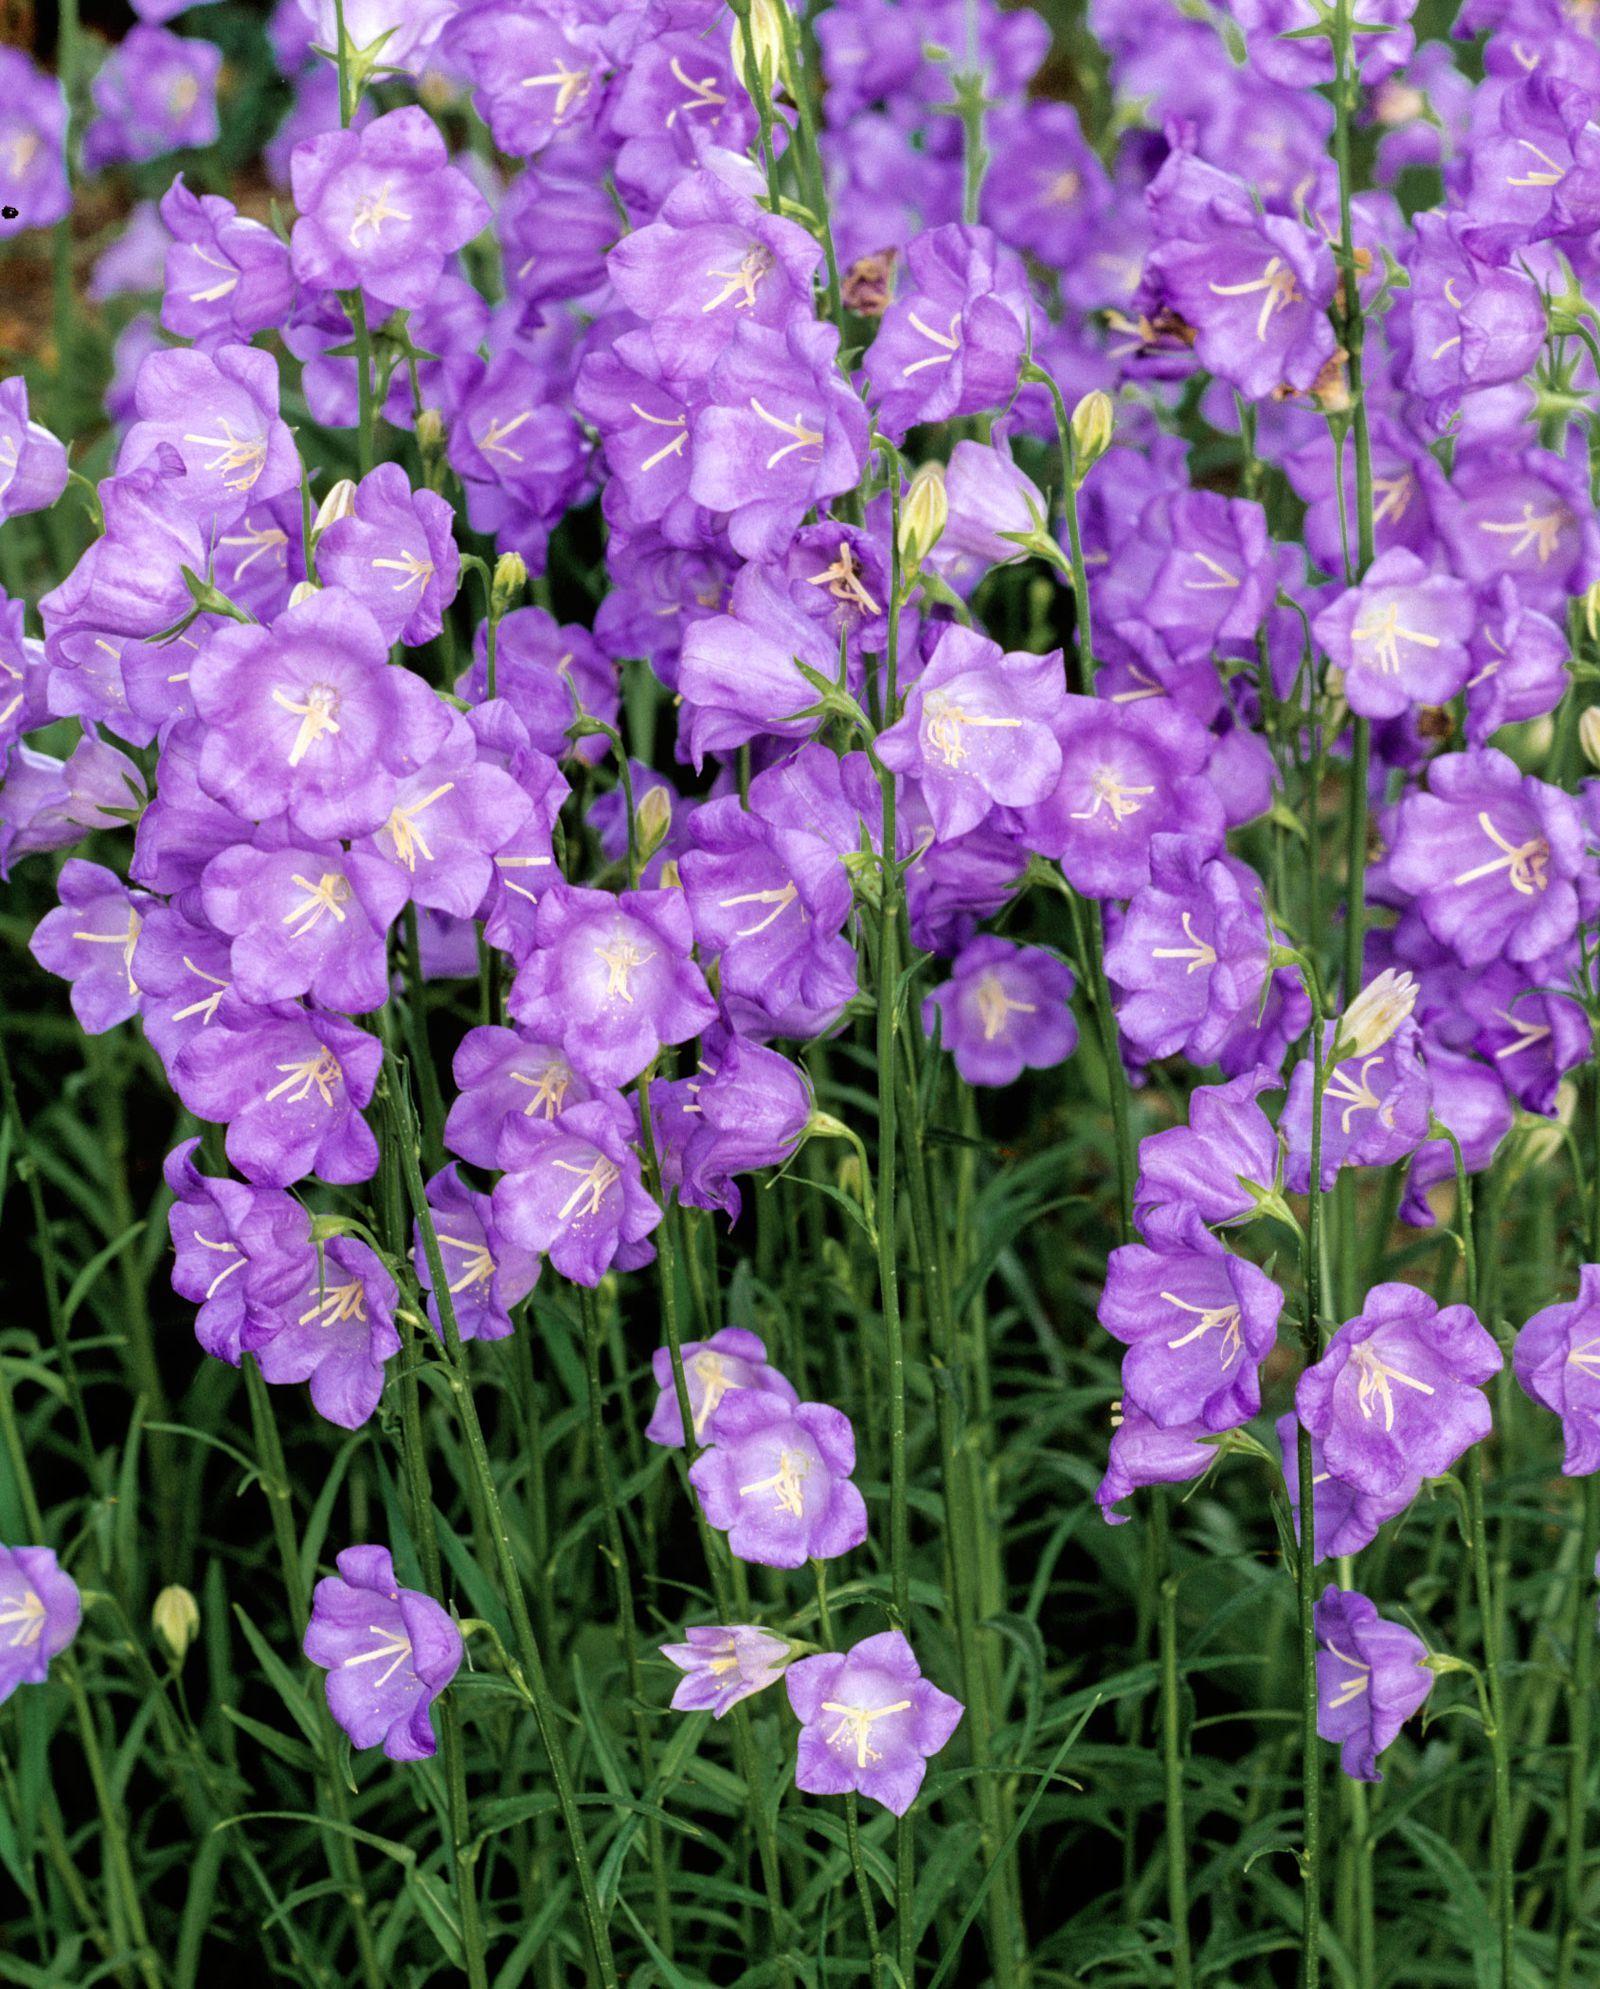 7 Perennials That Will Bloom Multiple Times This Summer Flowers Perennials Plants Perennials